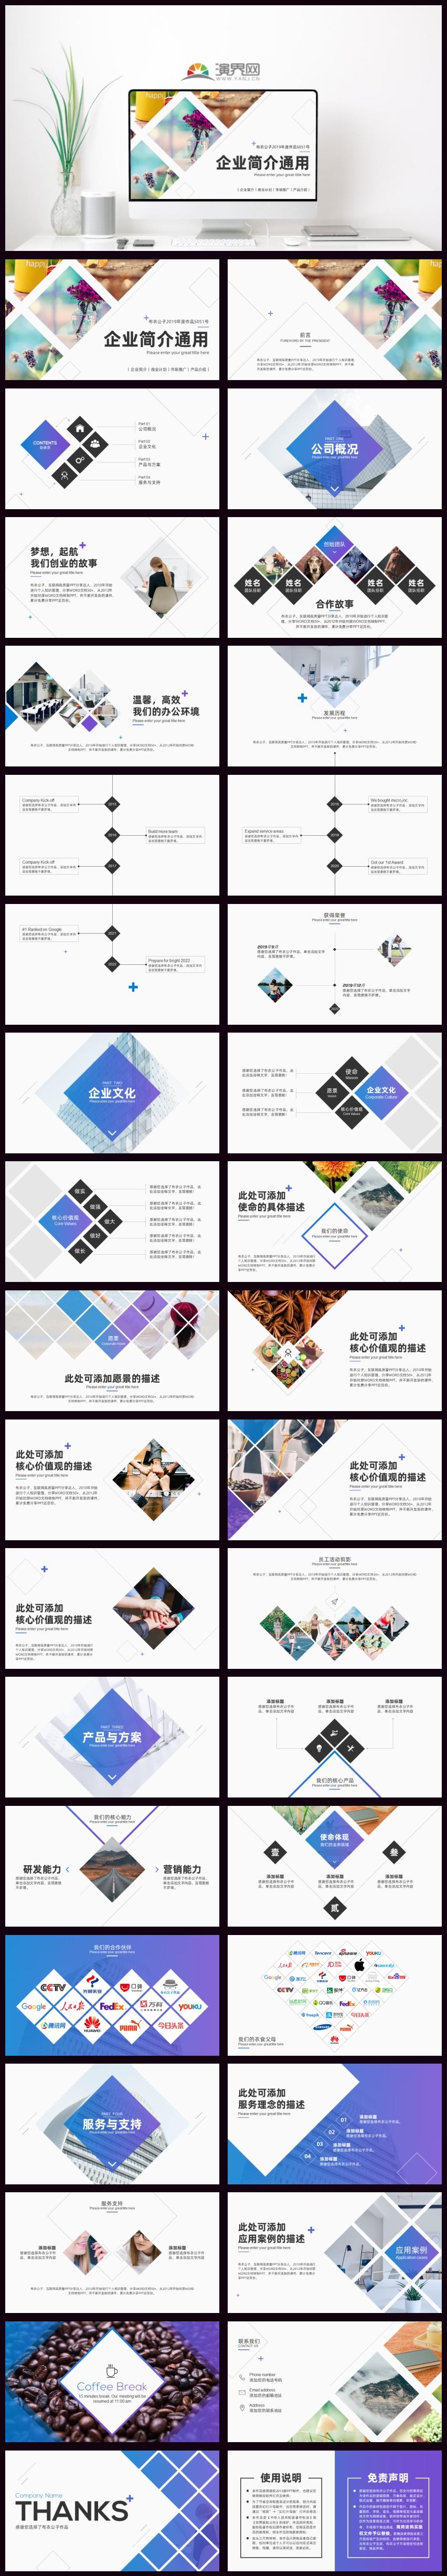 S051-菱形2020企业简介产品介绍PPT模板(布衣公子作品)